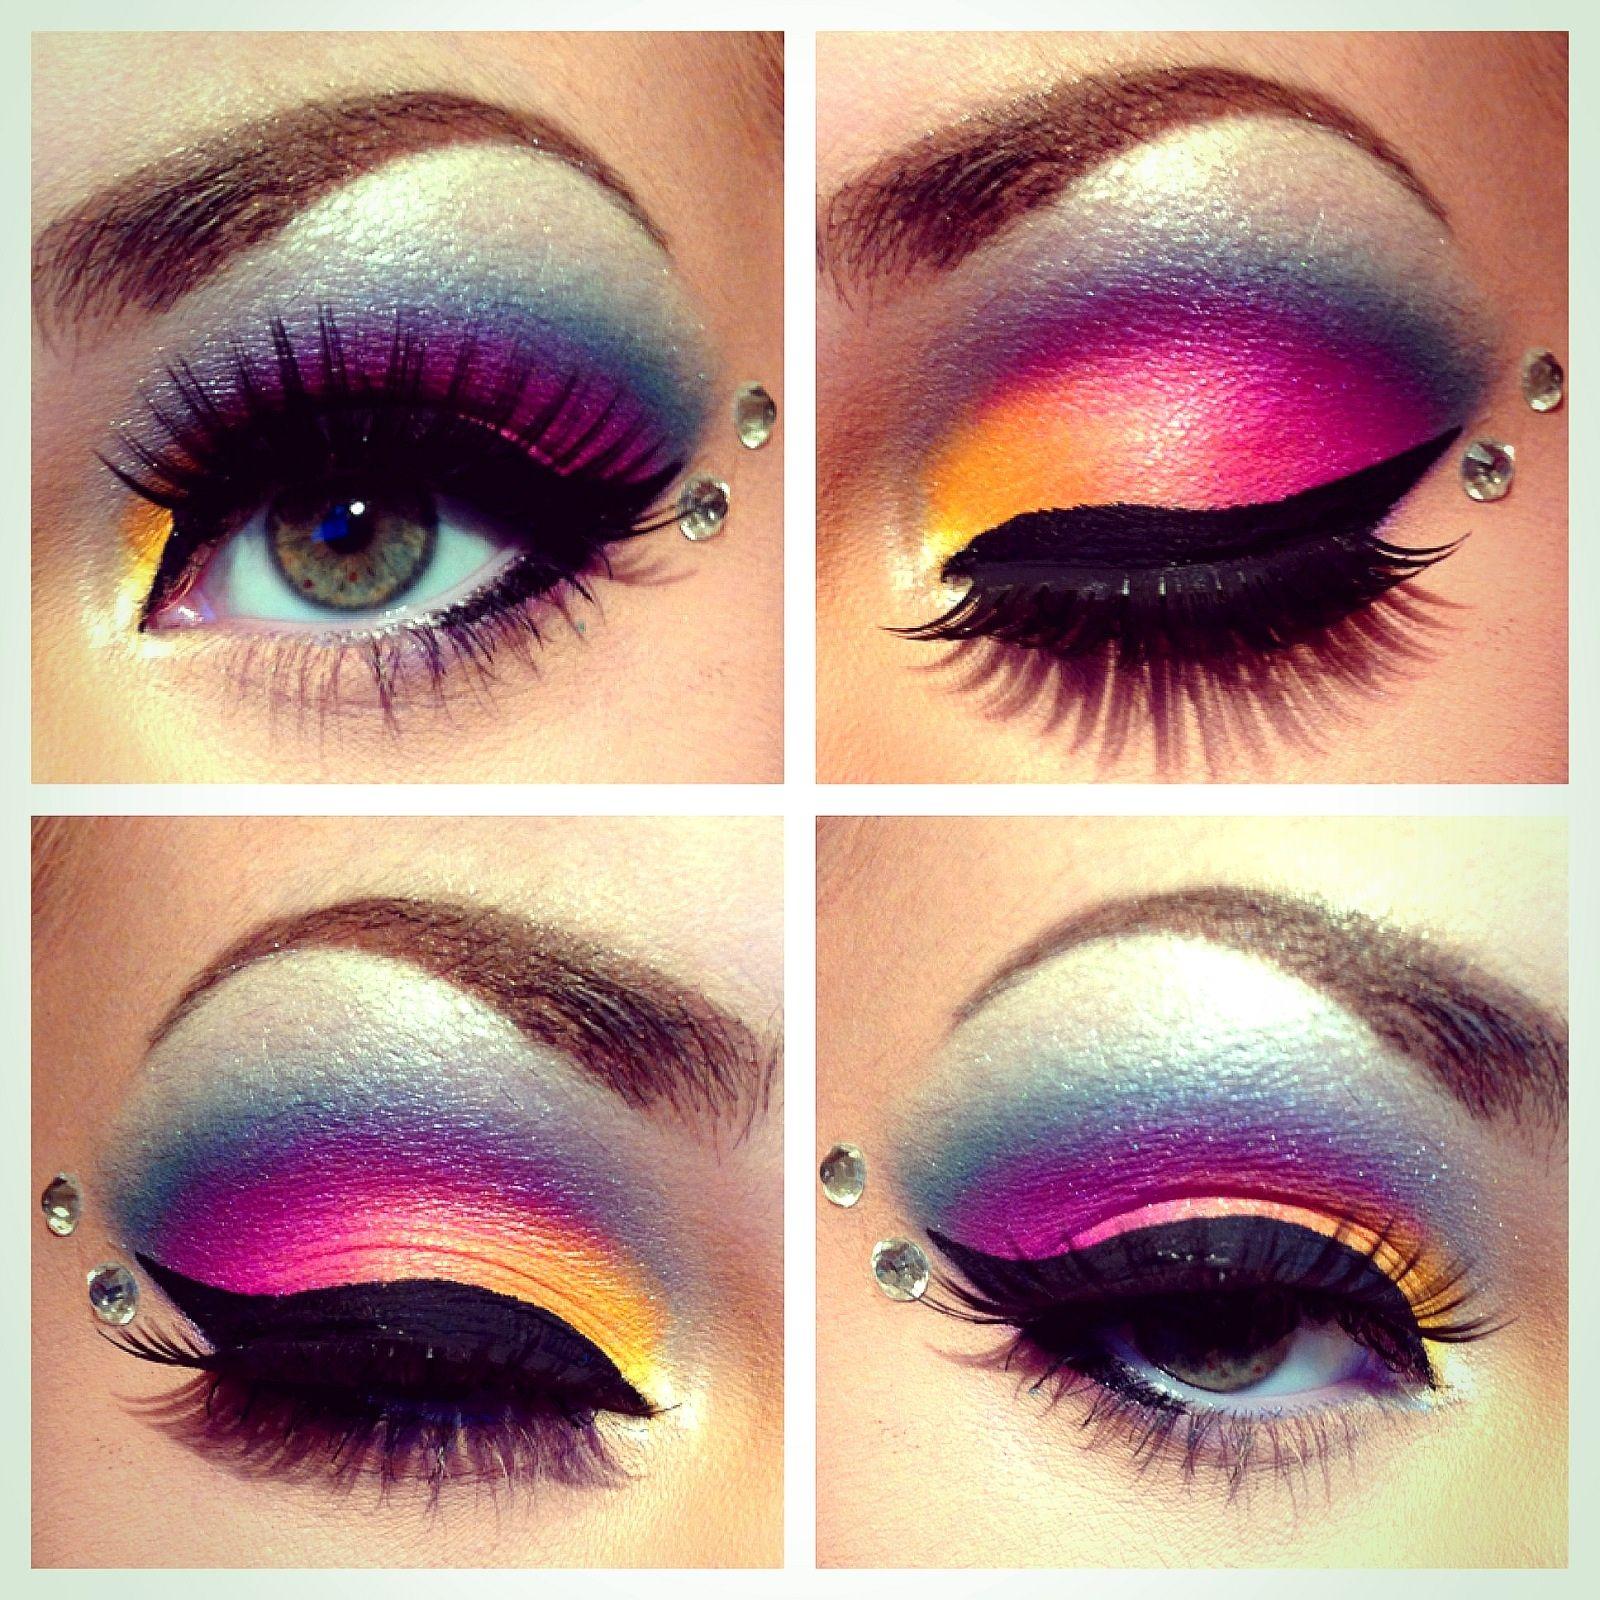 Lisa frank inspired eye makeup